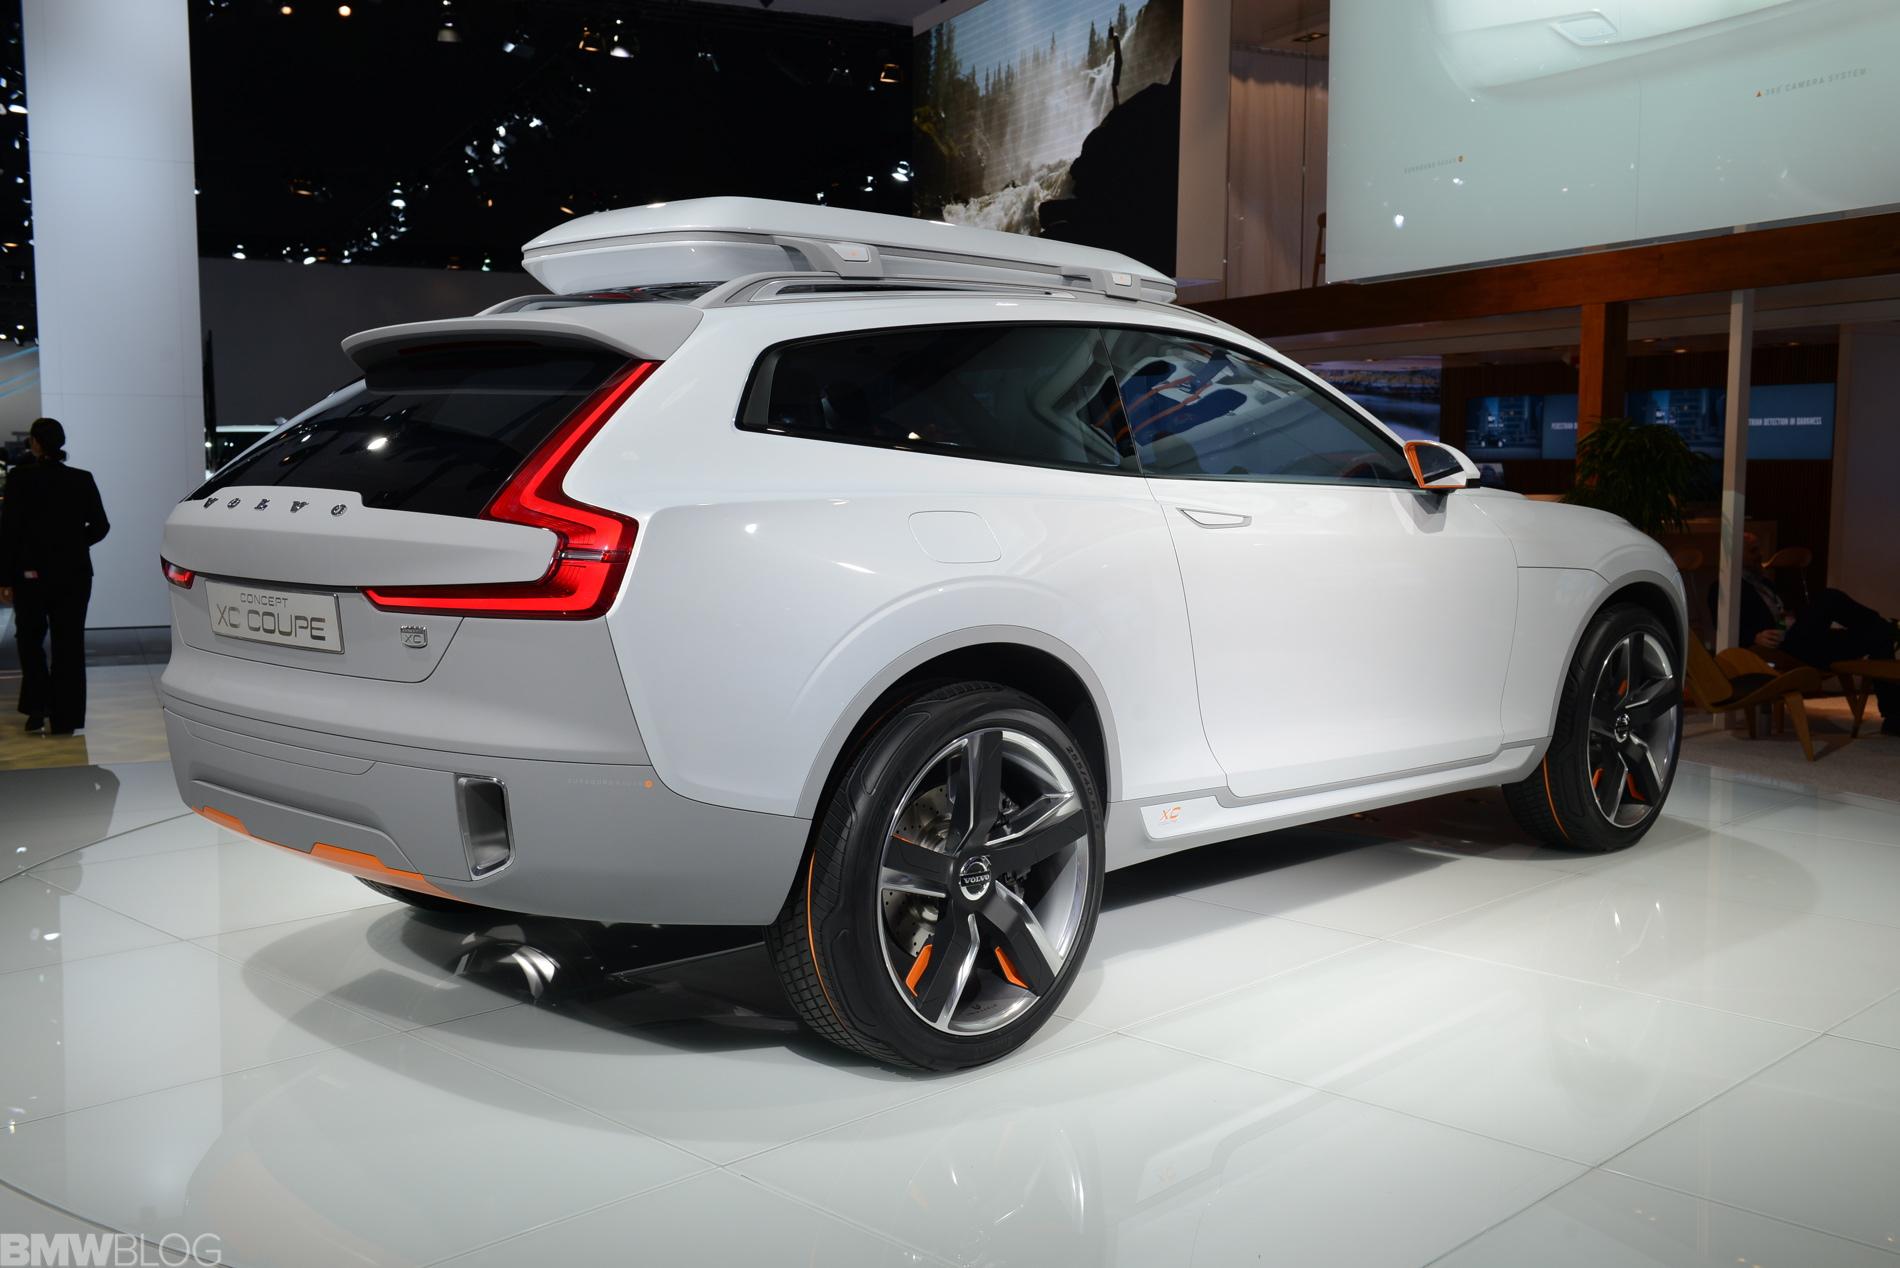 Volvo XC Coupe Concept - 2014 NAIAS